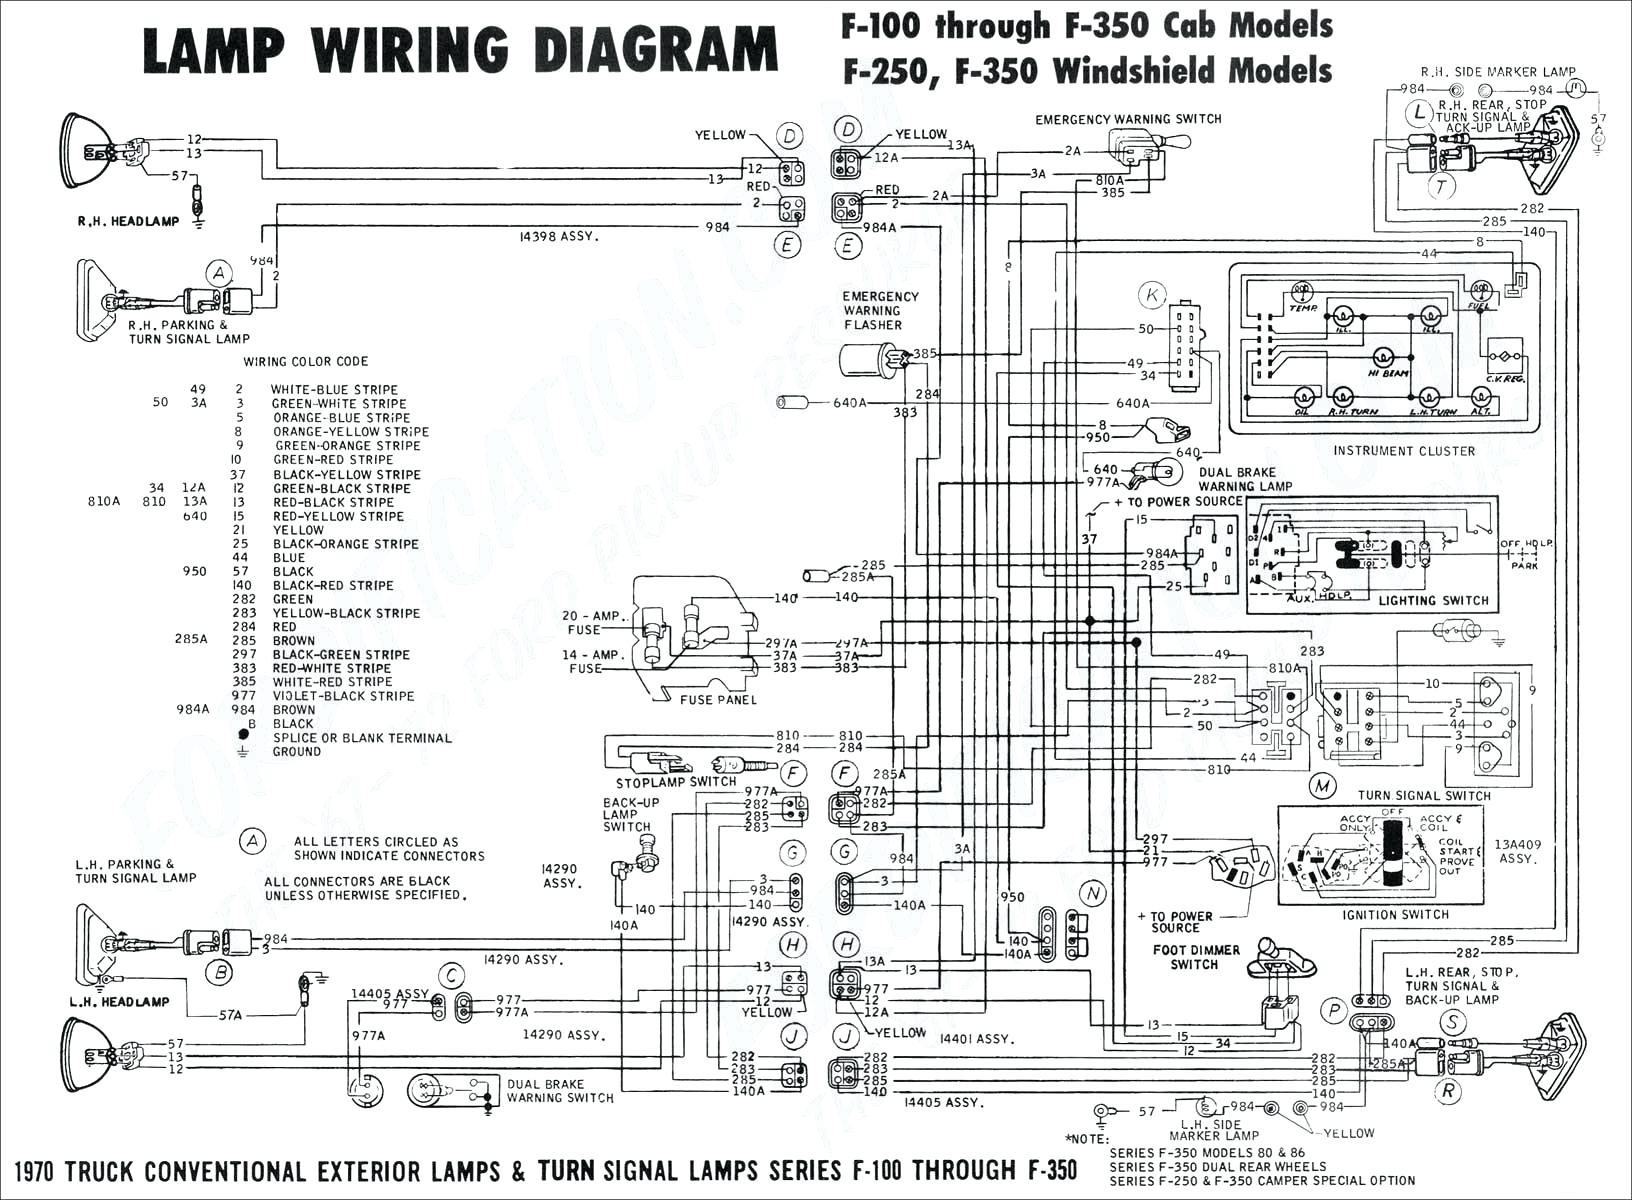 Stop Turn Tail Light Wiring Diagram Beautiful 1979 ford F150 Tail Light Wiring Diagram Electrical Website